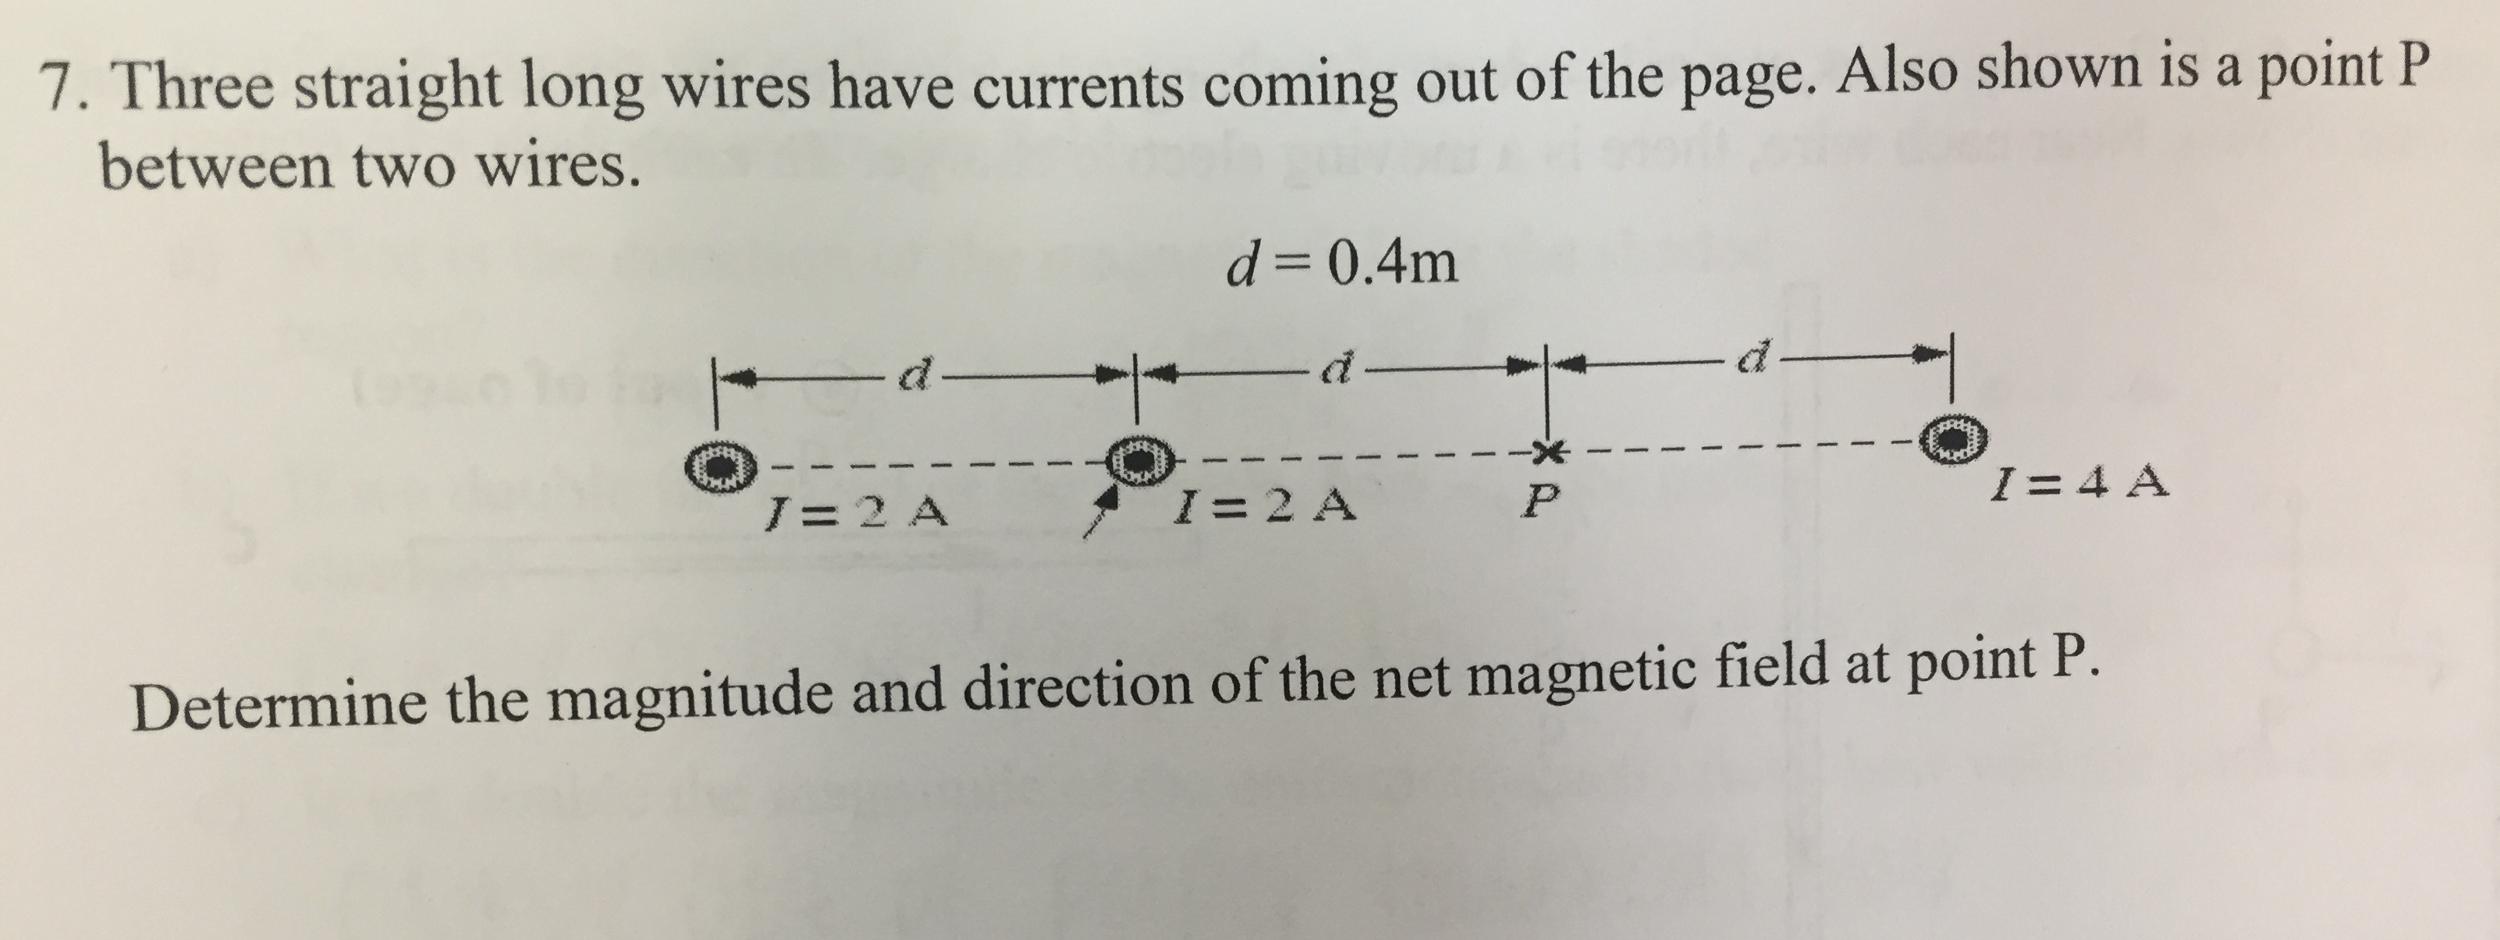 Physics Archive | February 25, 2016 | Chegg.com